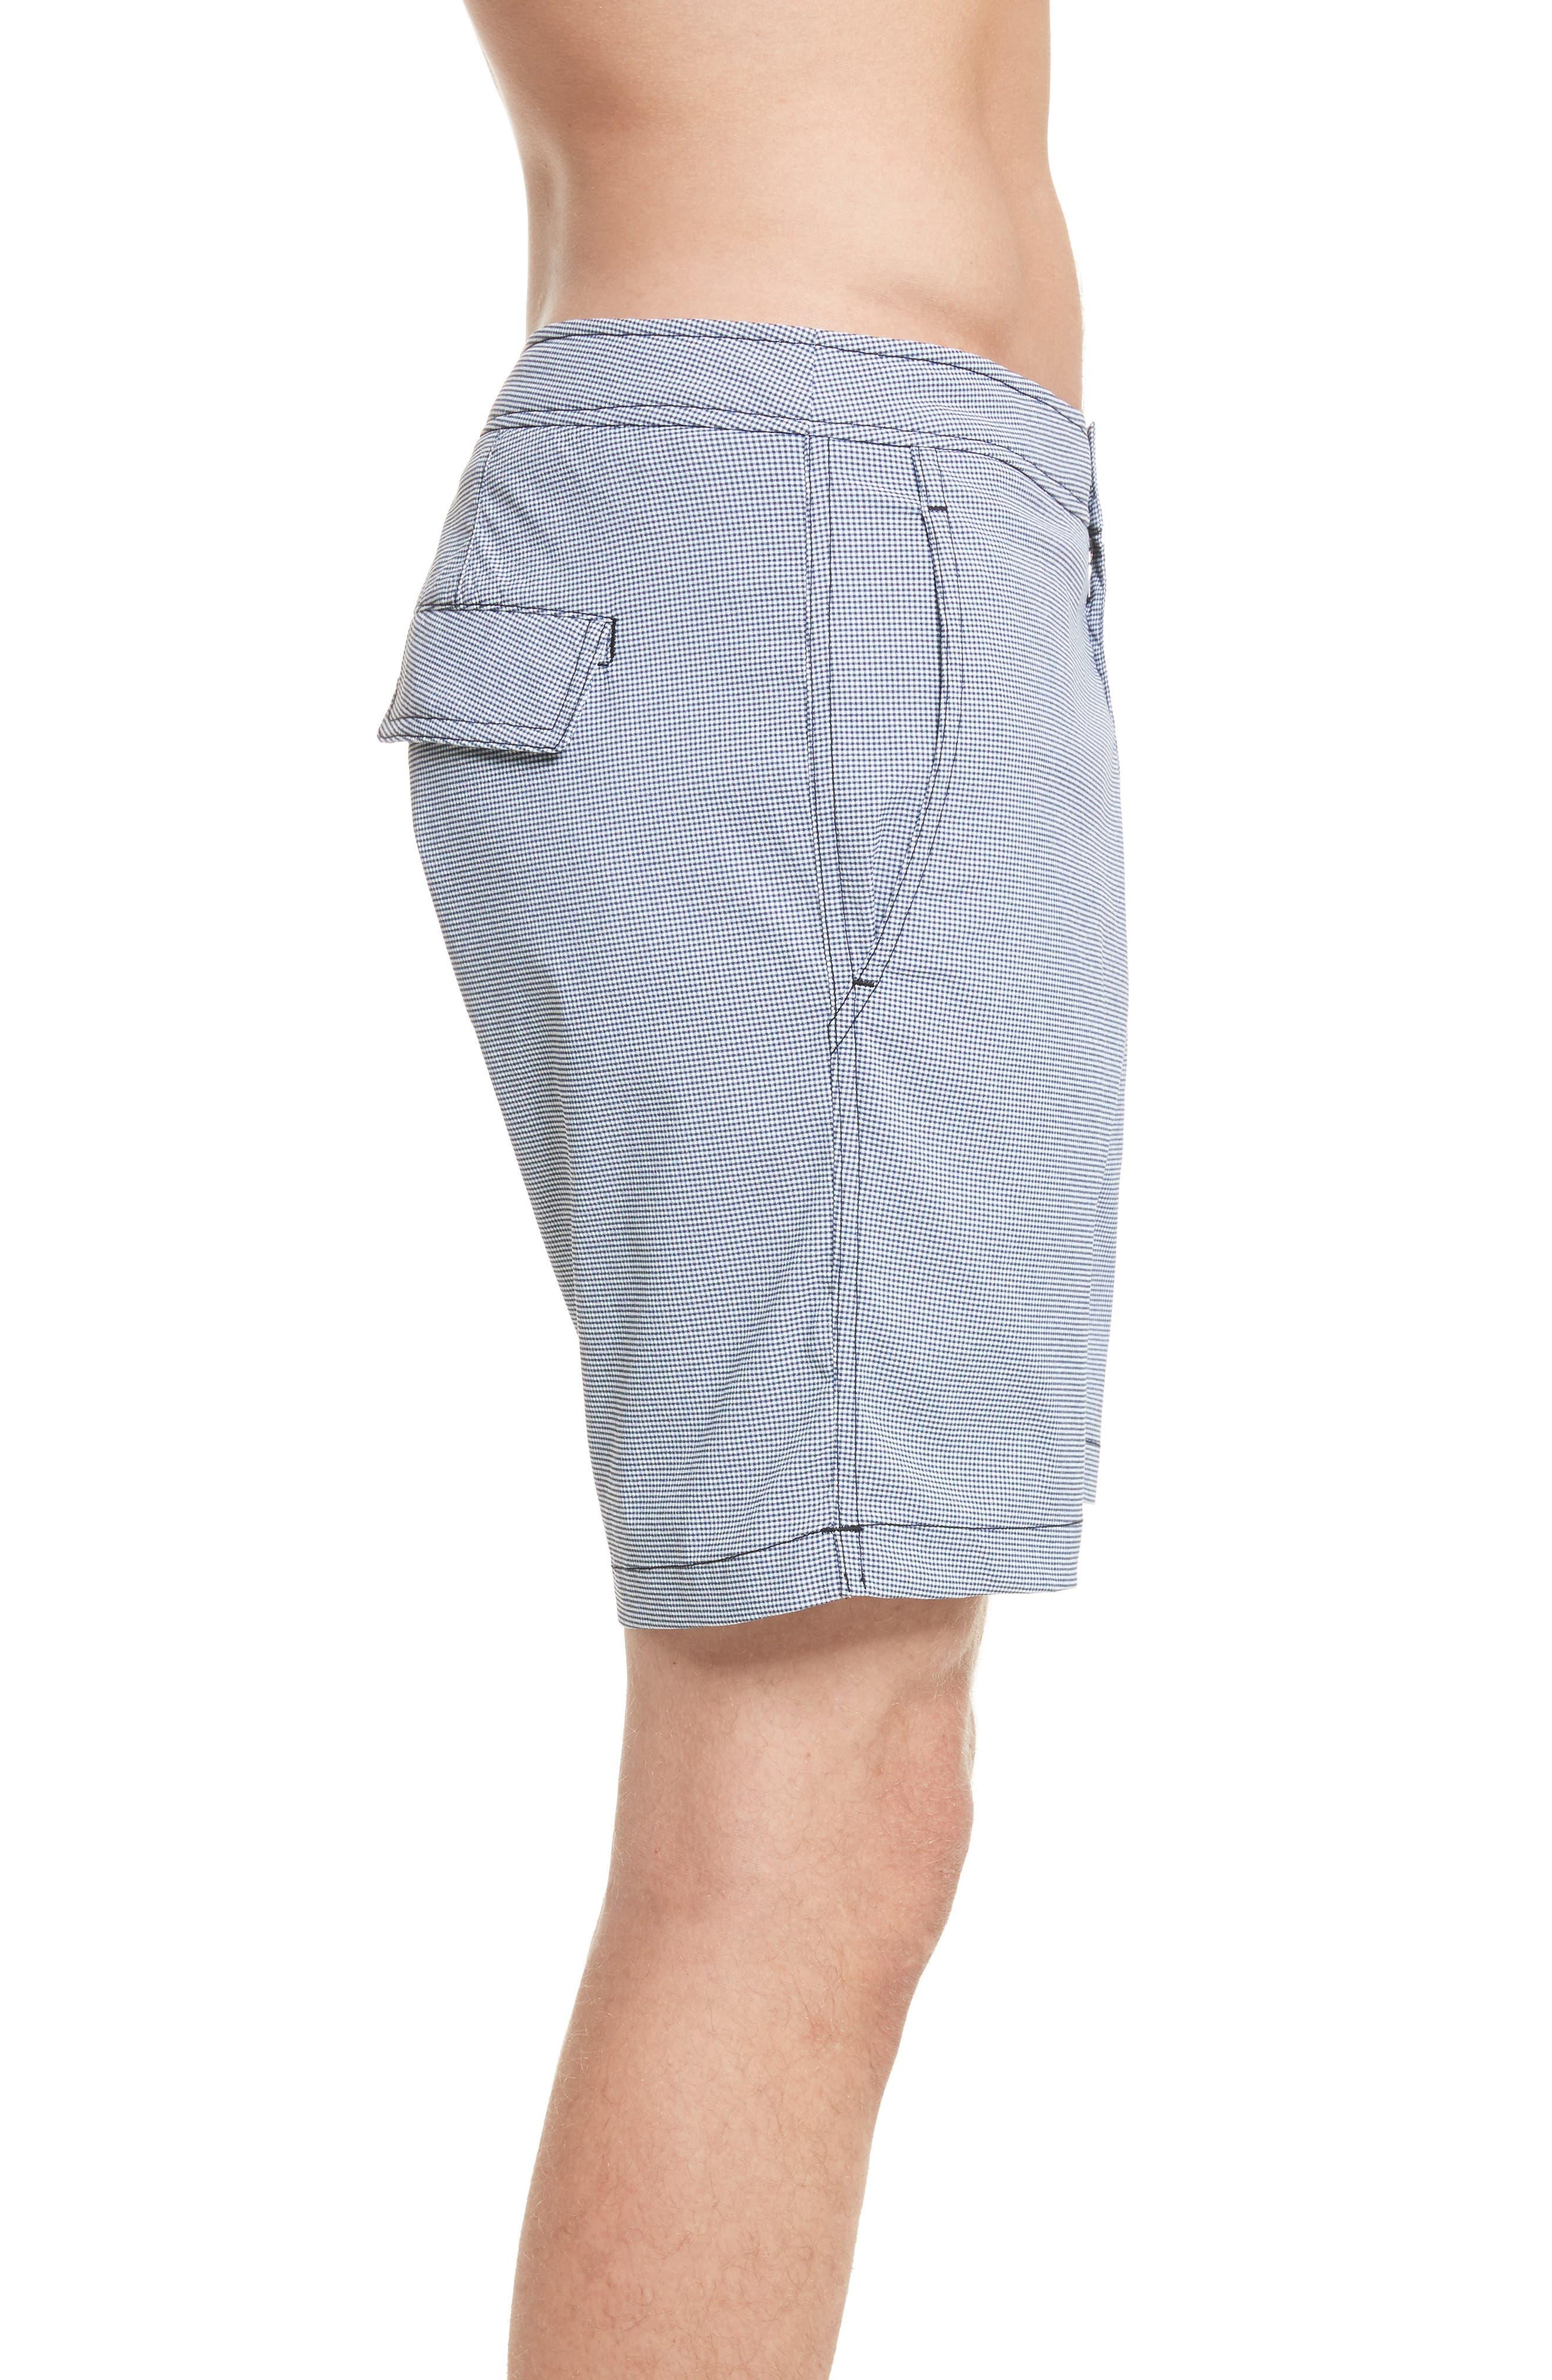 Calder Gingham Board Shorts,                             Alternate thumbnail 3, color,                             Deep Navy/White